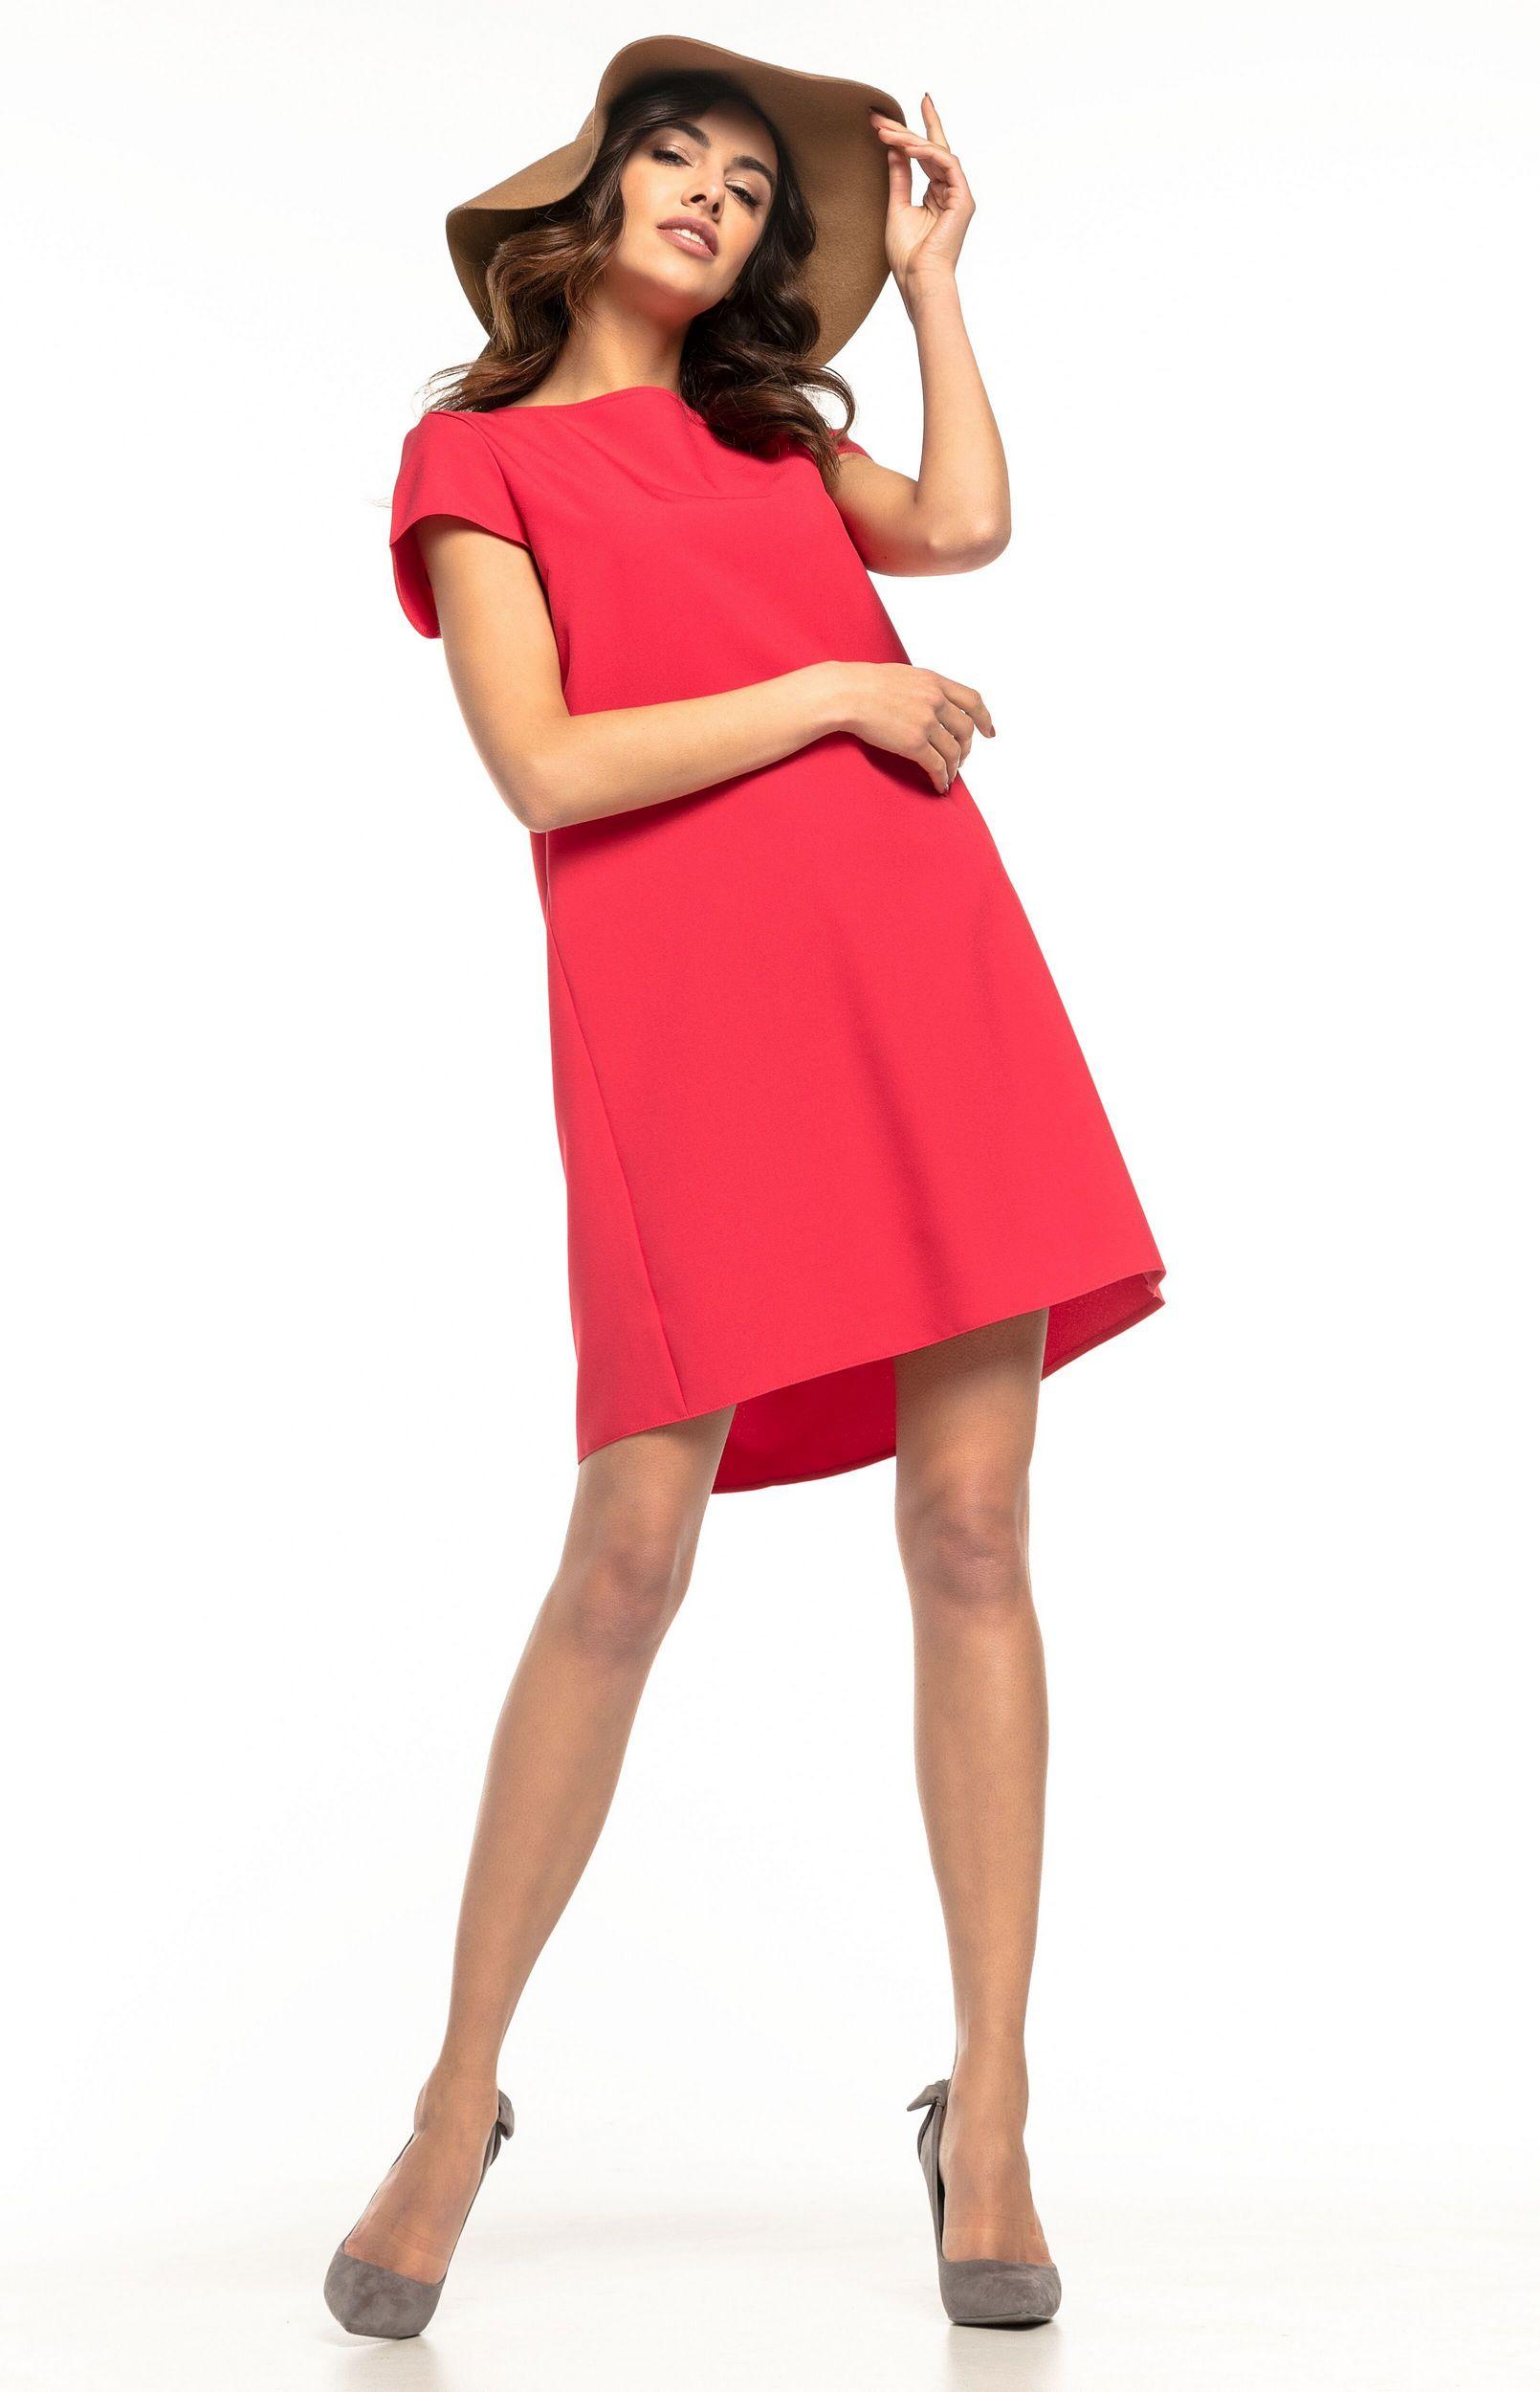 9eddc838232 Robe ample courte rouge Tess T261R   idresstocode  boutique de ...